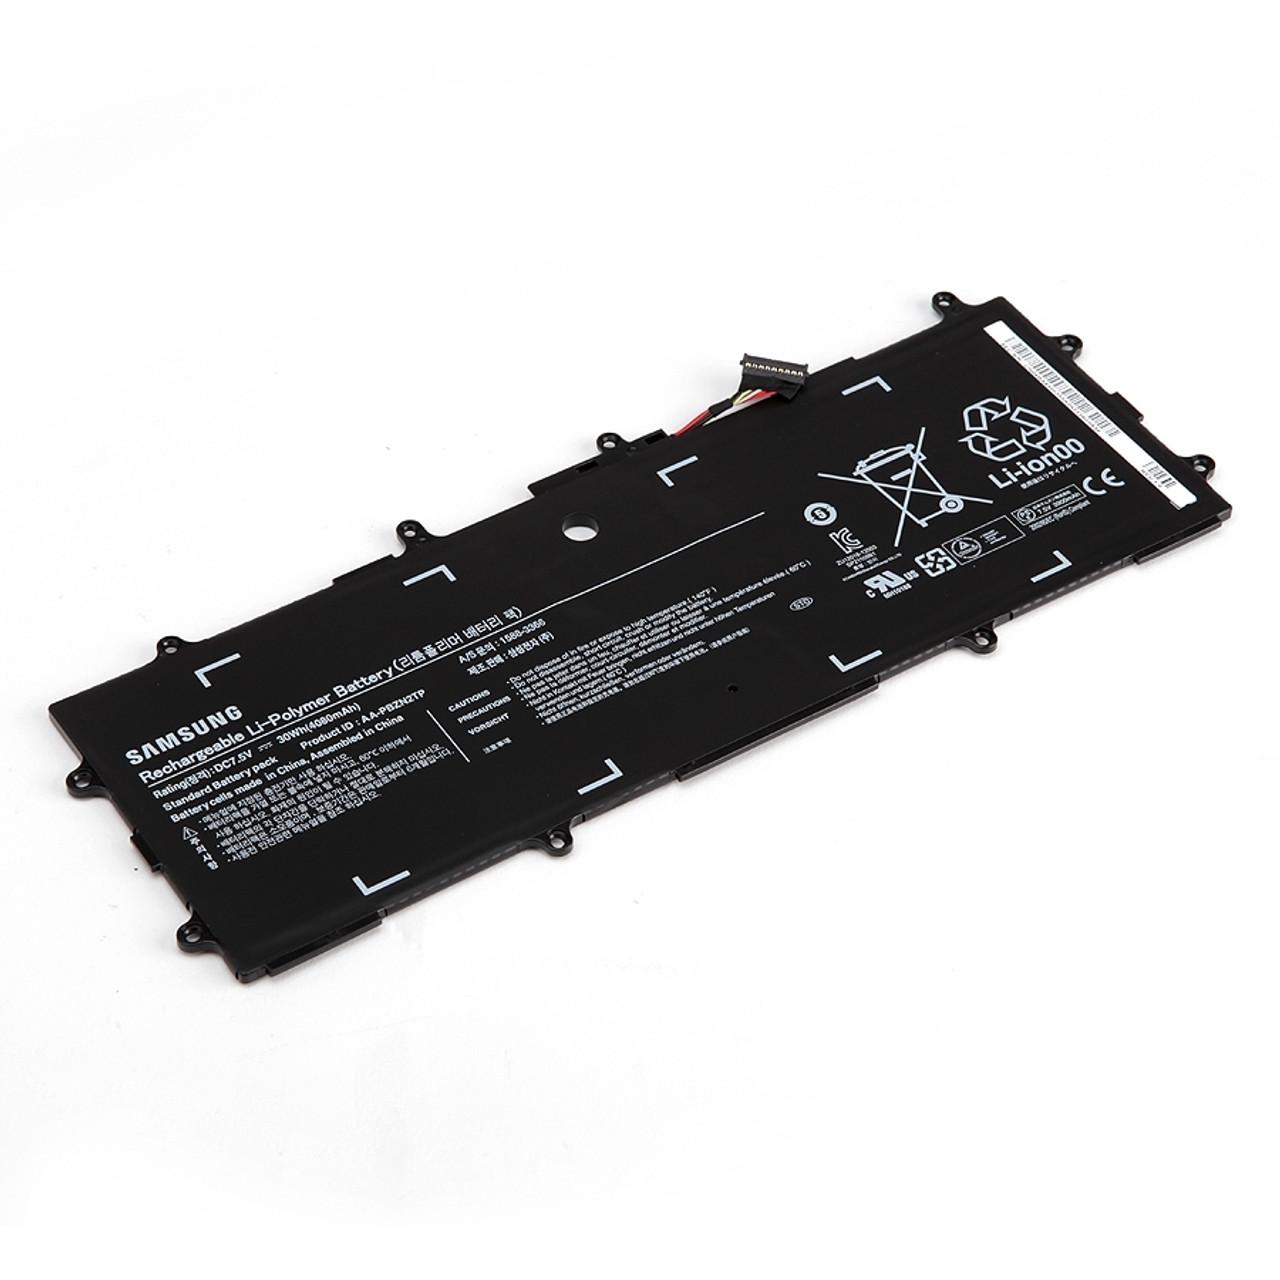 Samsung XE303C12/XE500C12/XE503C12 Chromebook Battery